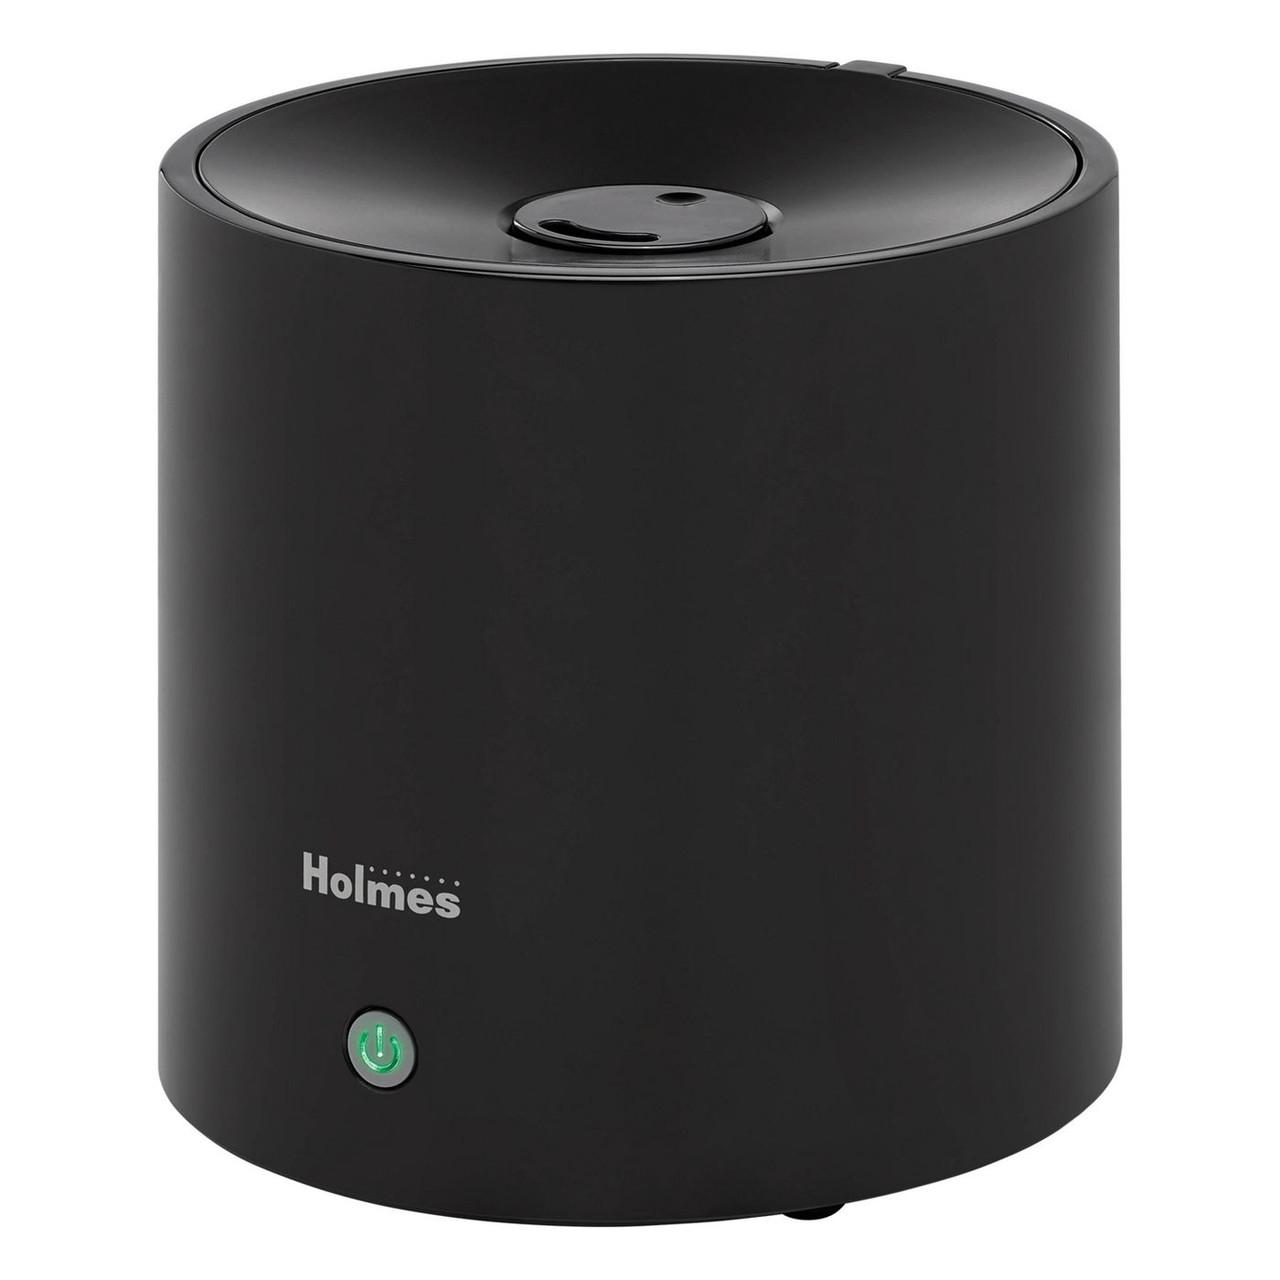 Holmes UHD 4k WiFi Air Purifier Nanny Camera Includes a 128 Gig sd card W/ Live View WiFi + Dvr